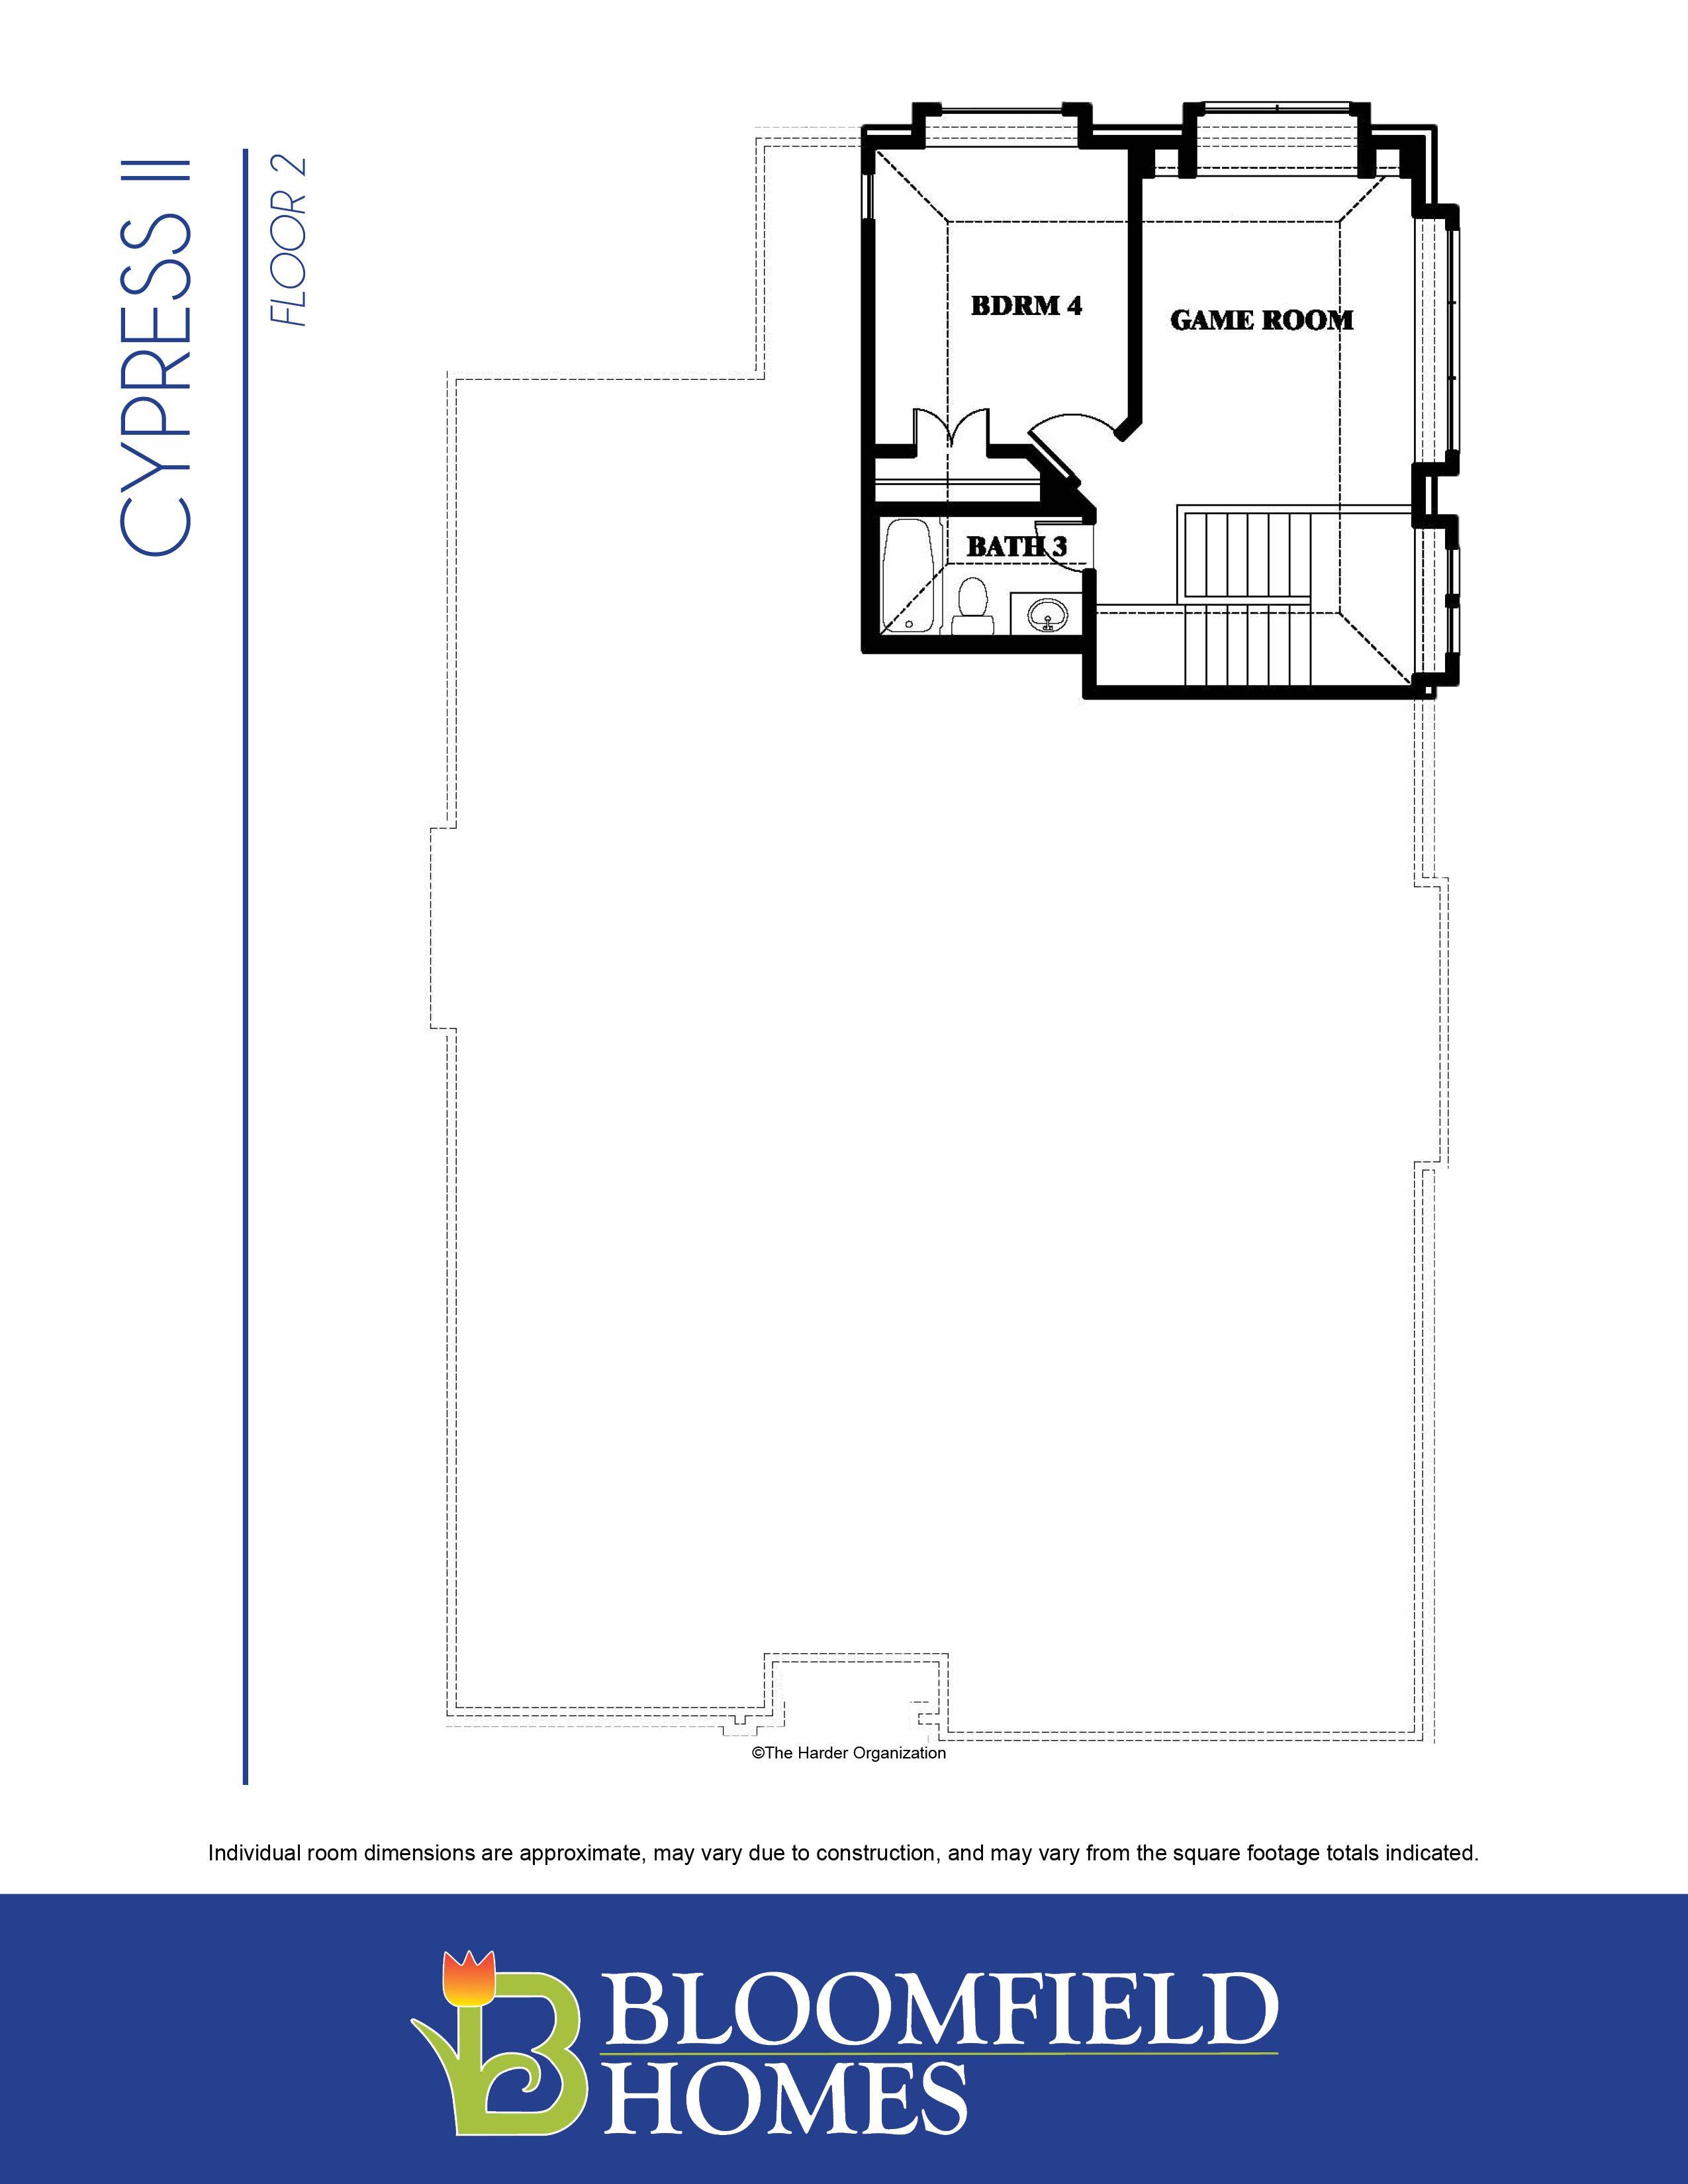 Cypress II Plan Crowley Texas 76036 Cypress II Plan at Rosemary – Bloomfield Homes Floor Plans